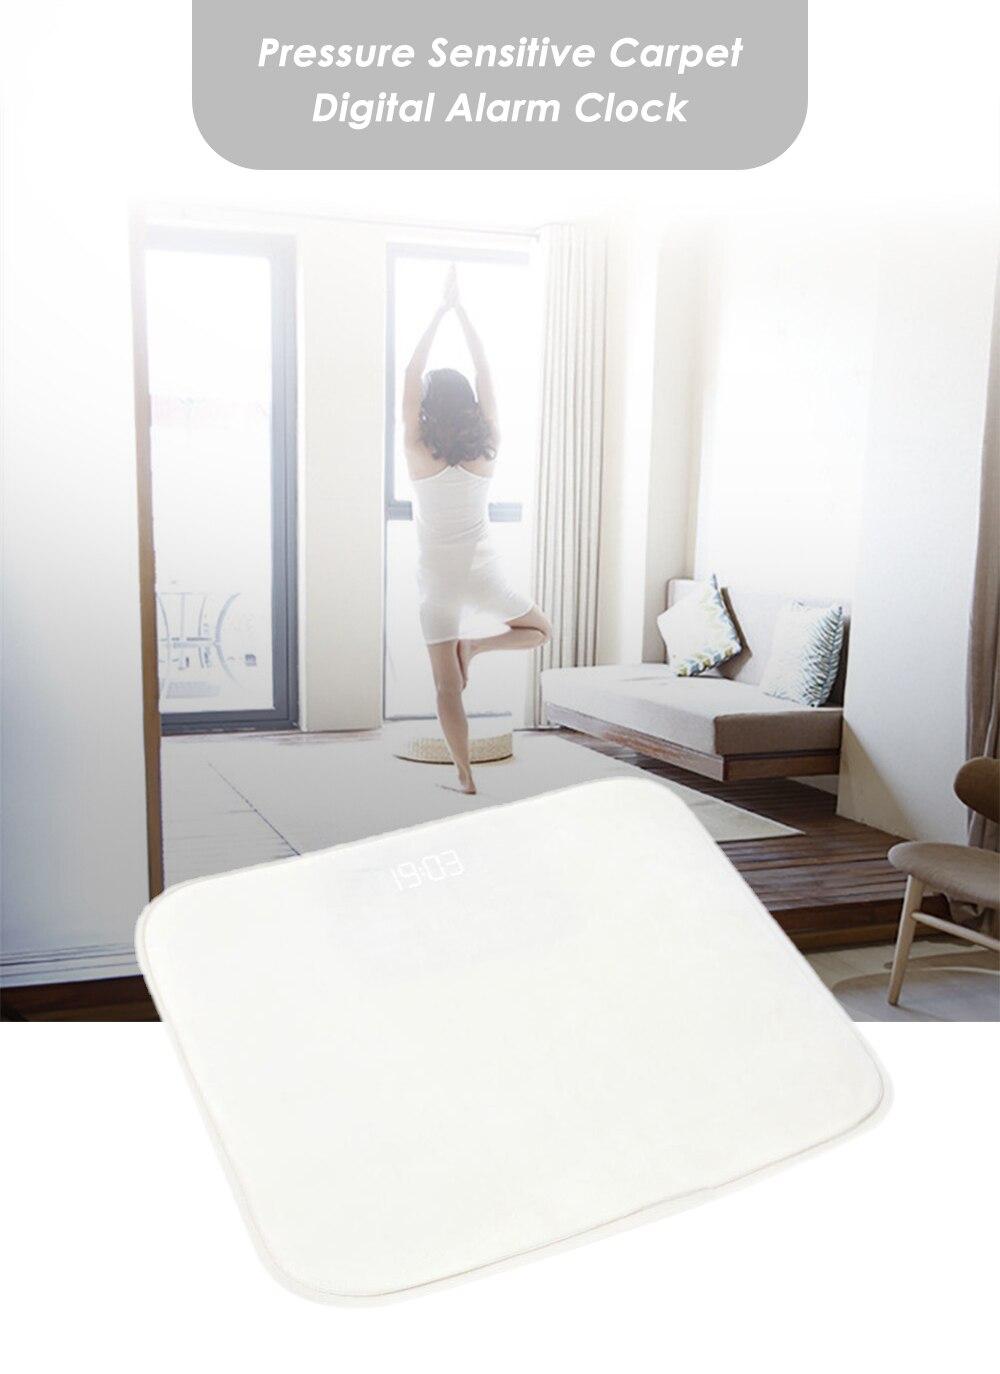 Pressure Sensitive Alarm Clock Rug Carpet Home Bed Room LED Digital Display